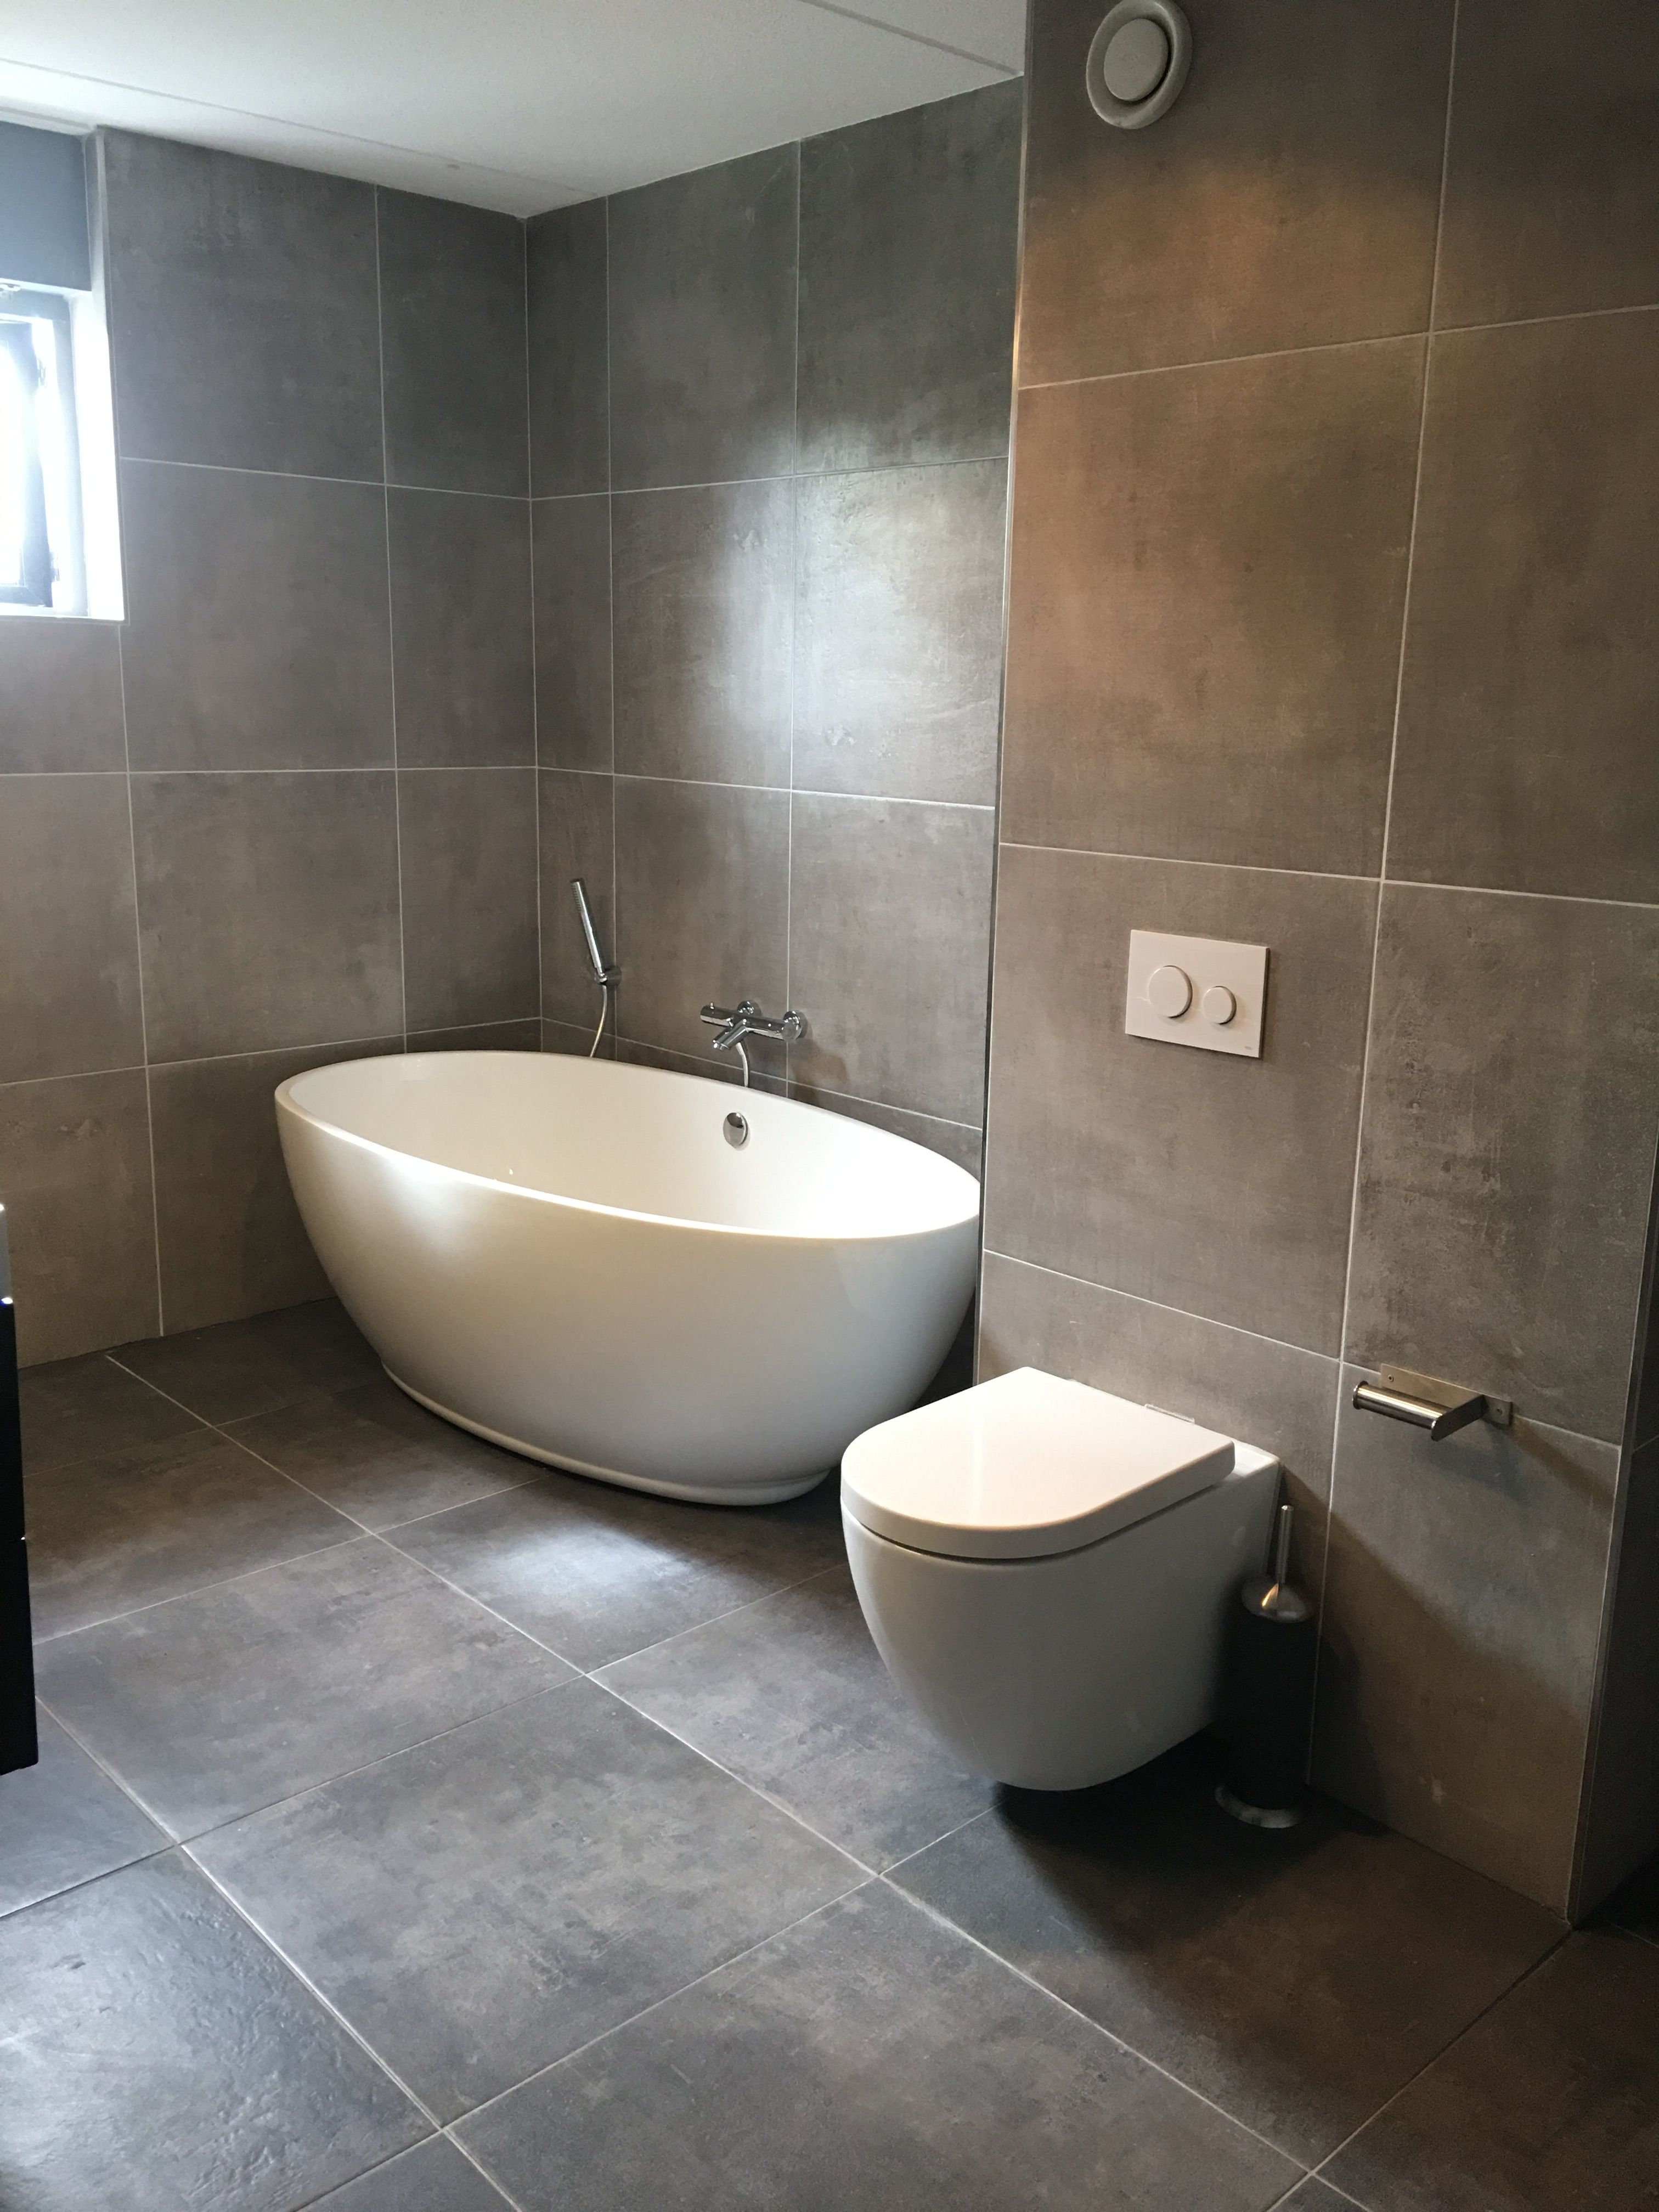 Bomber Bad Met Tece Inbouw Toilet, Lekker Strak Donkere Tegel